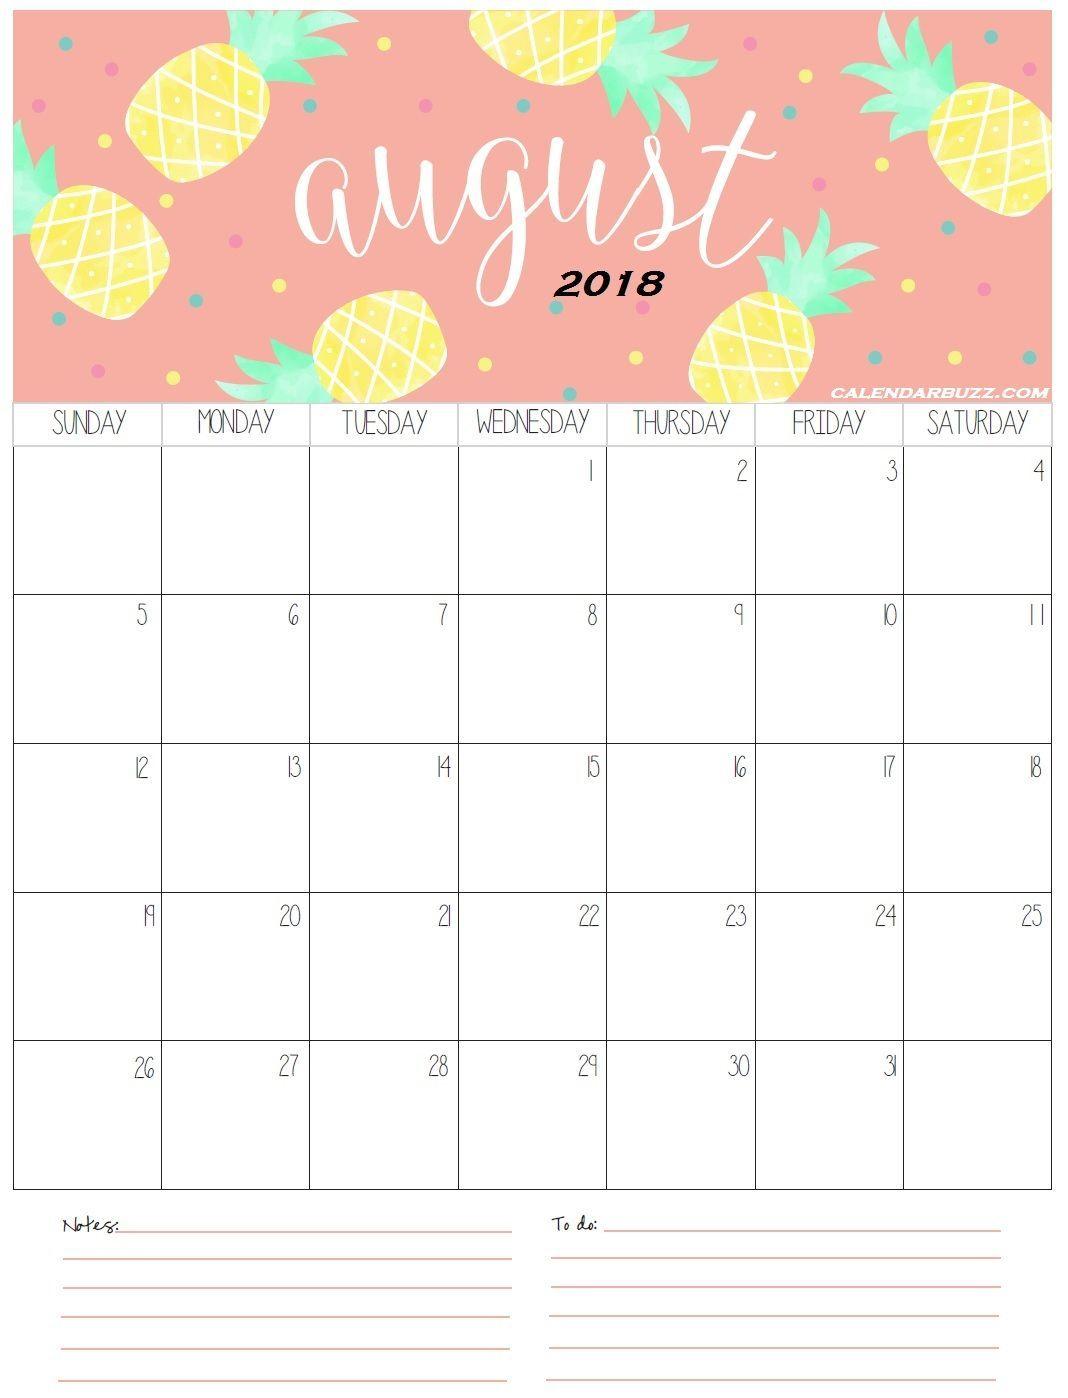 August 2018 Calendar Http Moussyusa Com Printable Calendar 2018